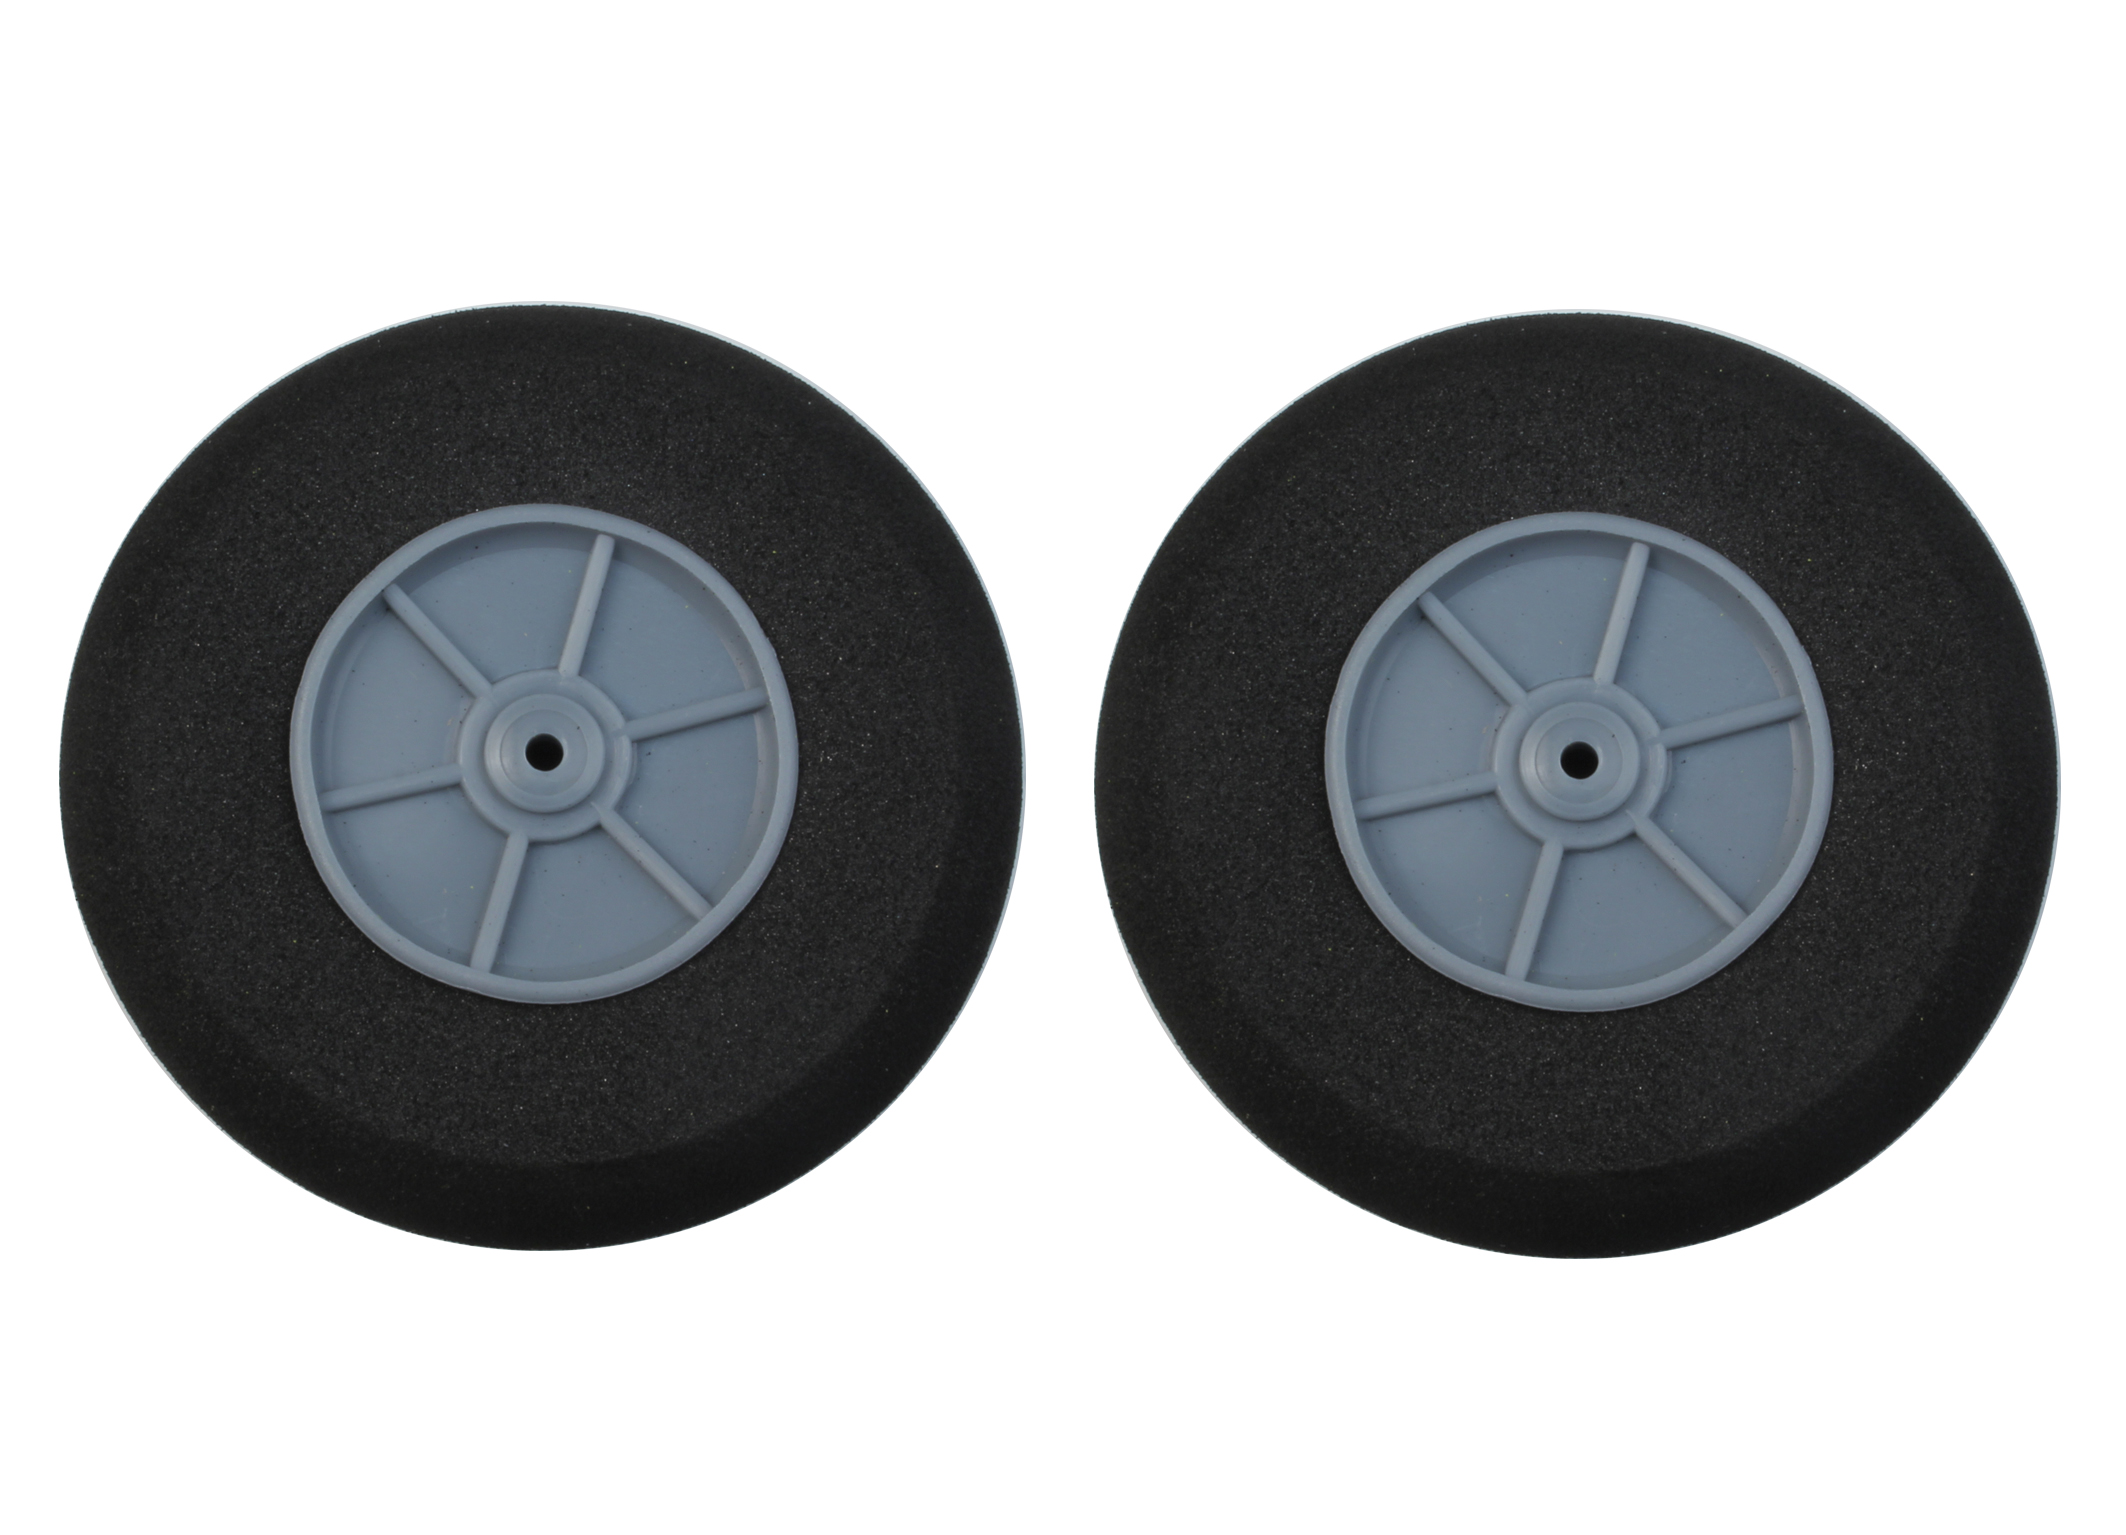 Moosgummiräder superleicht 26mm 1 Paar